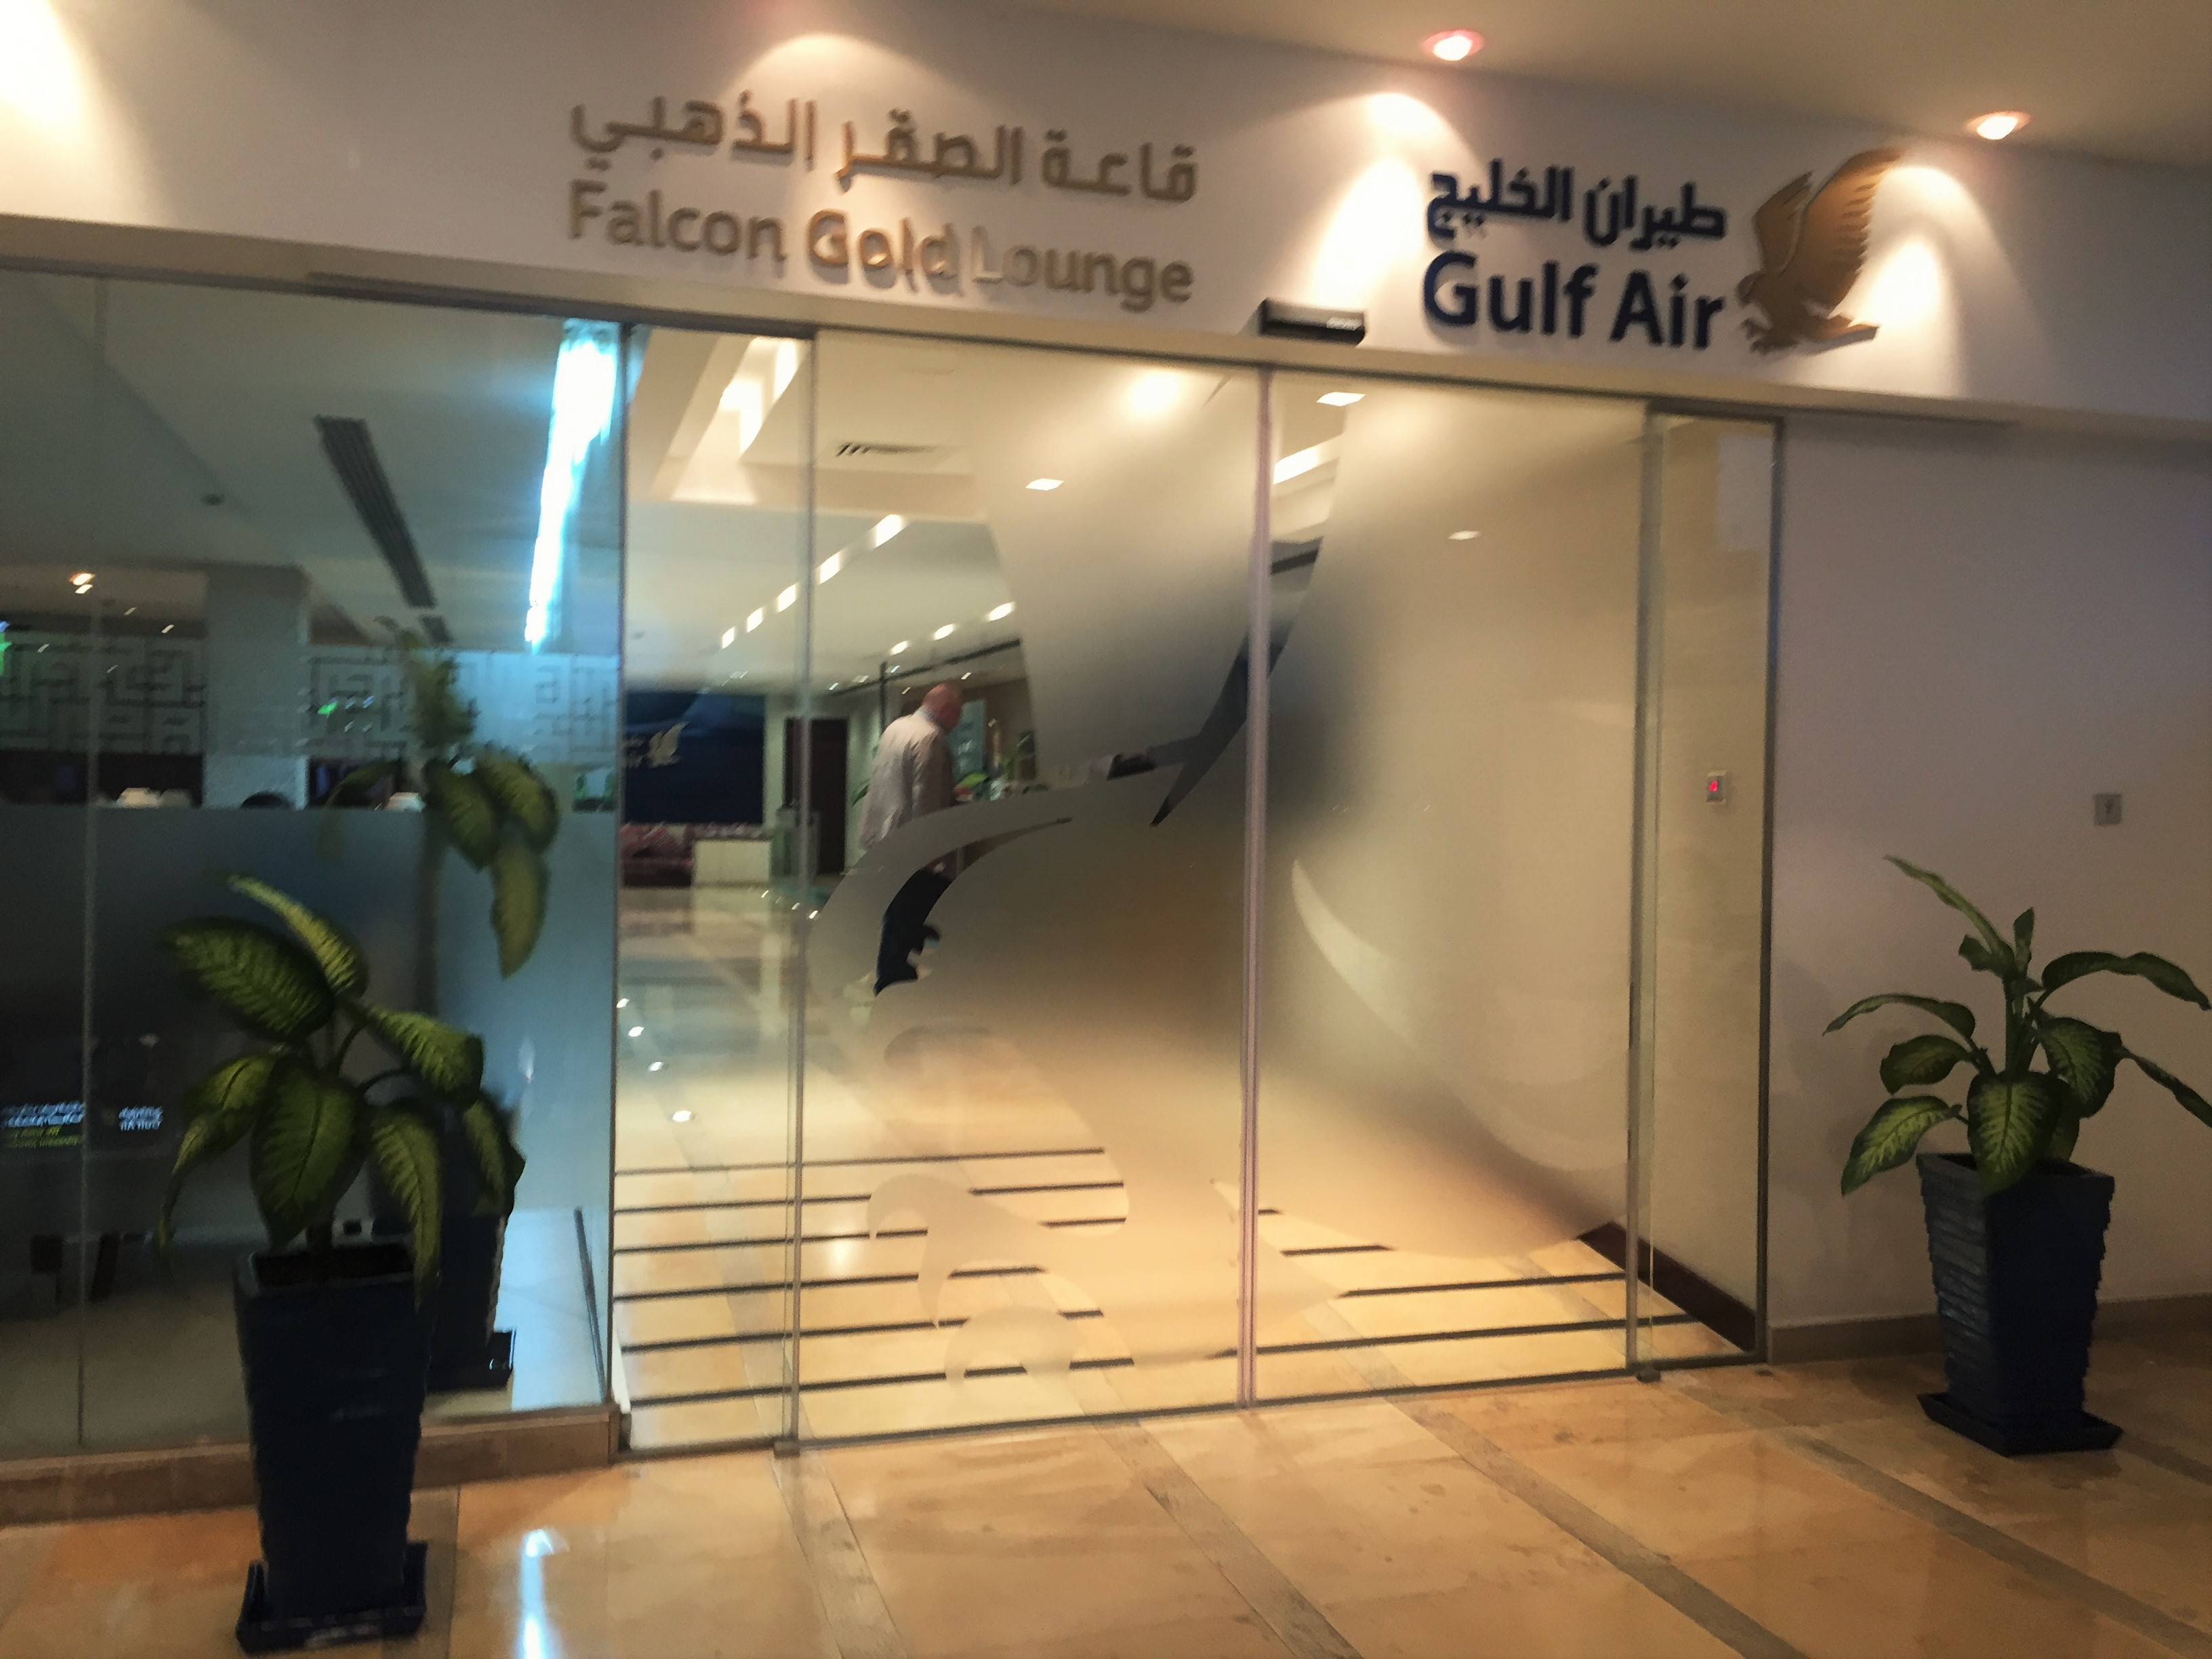 InsideFlyer Wochenrückblick Gulf Air Falcon Golf Lounge